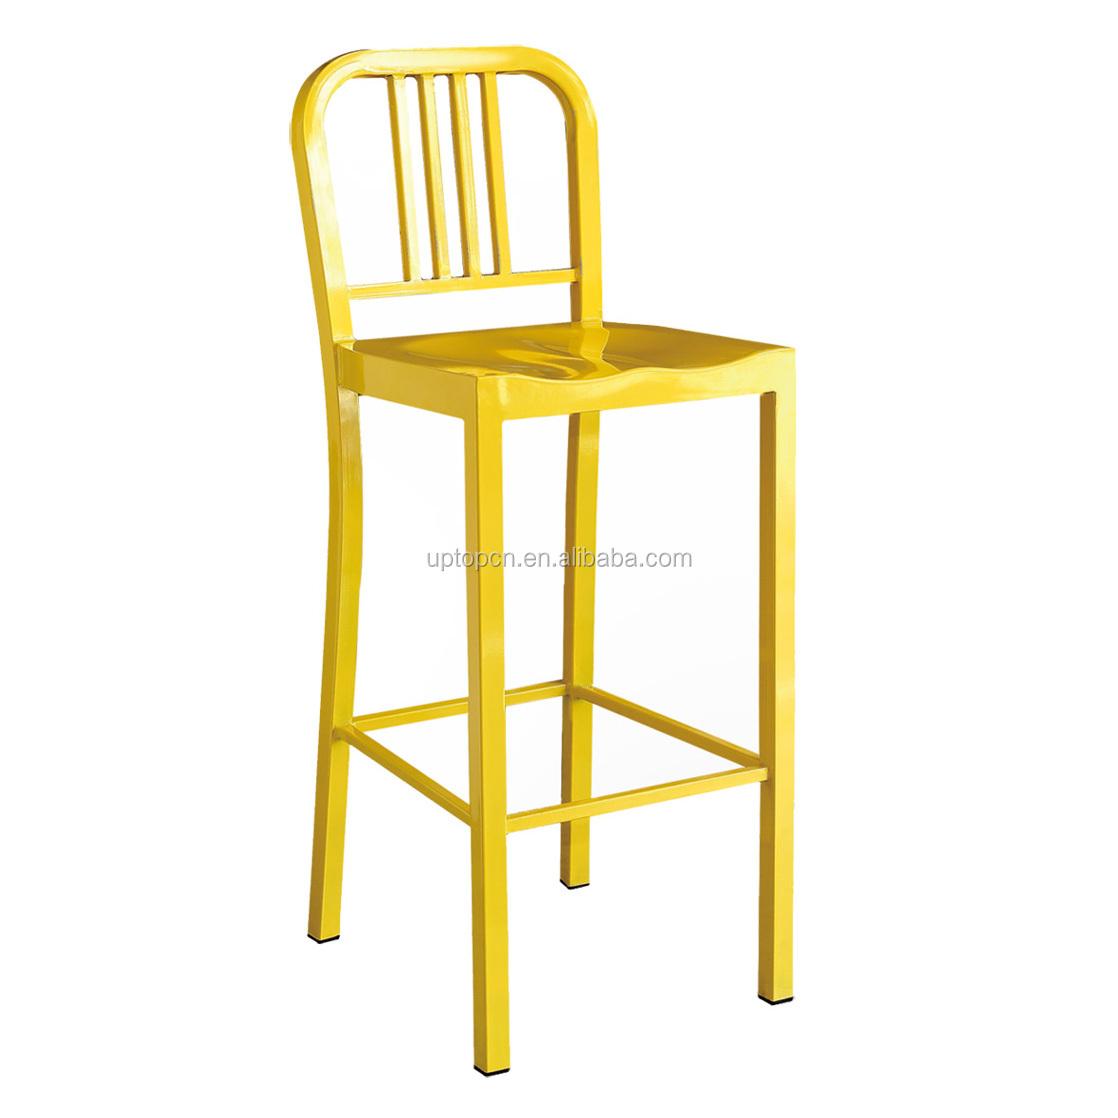 product-Uptop Furnishings-Sample design wood seat metal frame chair-img-8